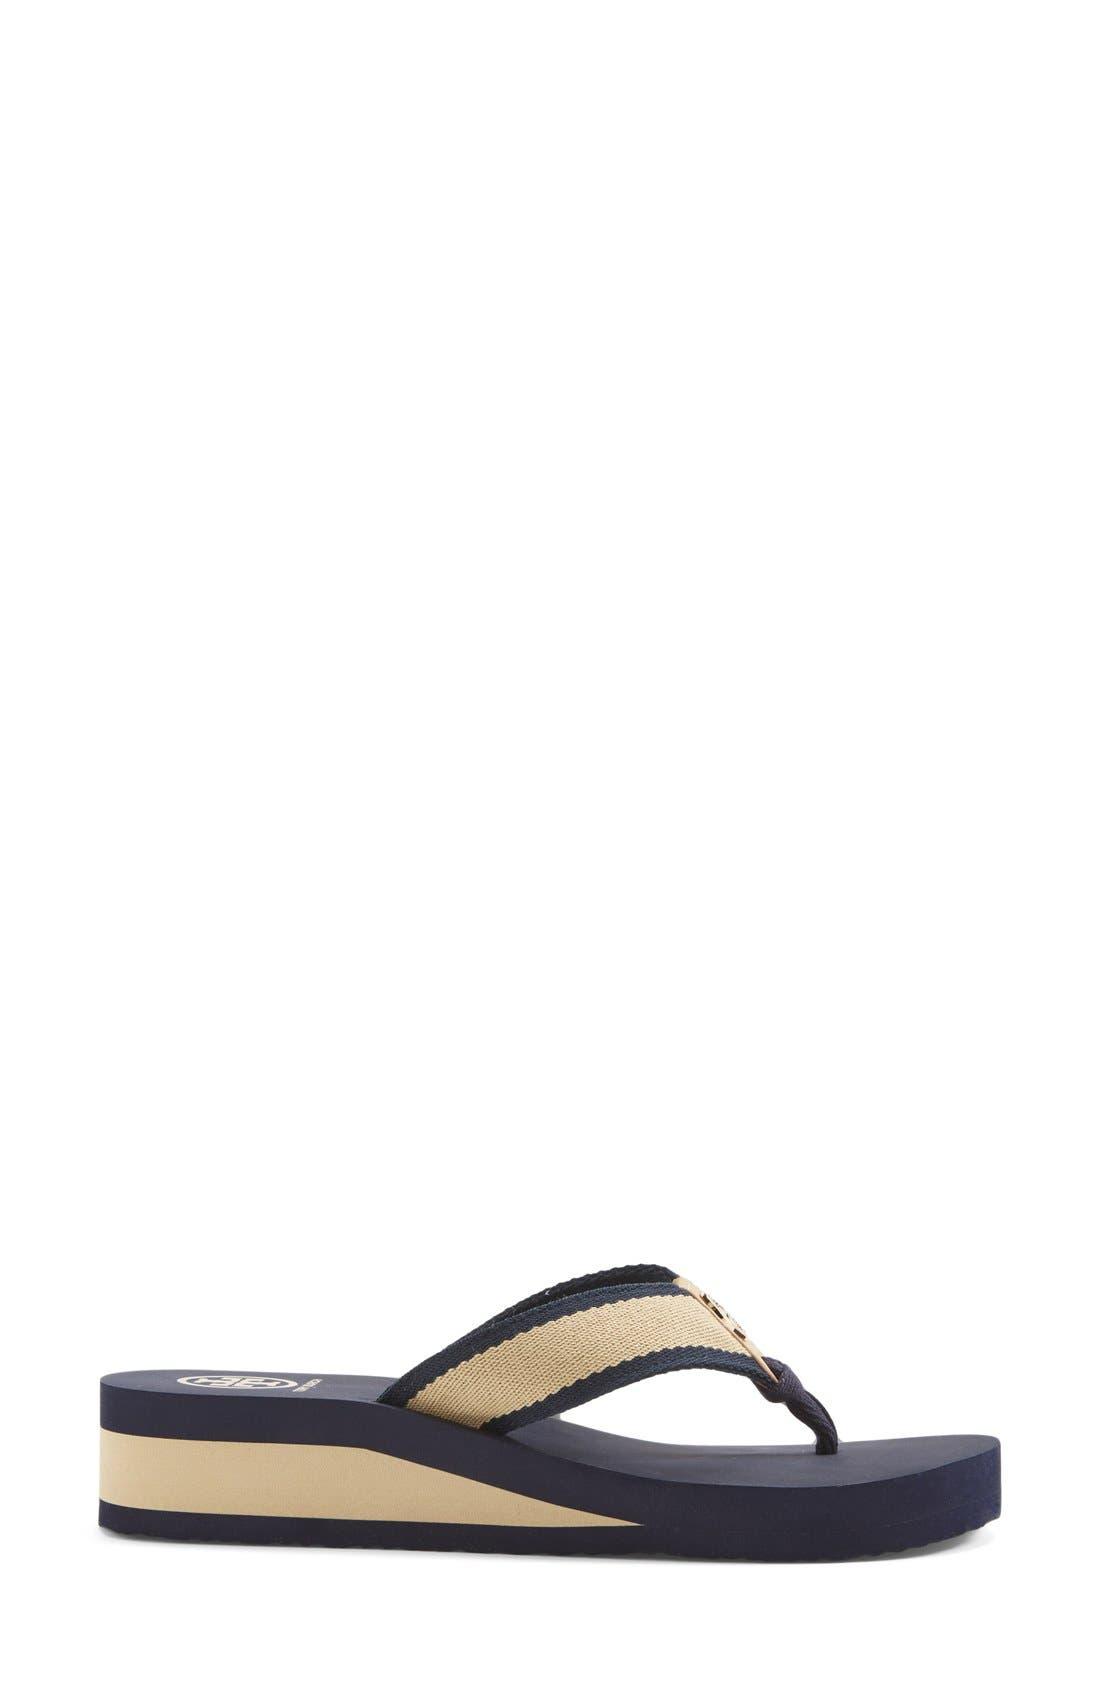 Alternate Image 3  - Tory Burch 'Frankie' Wedge Sandal (Women) (Nordstrom Exclusive)